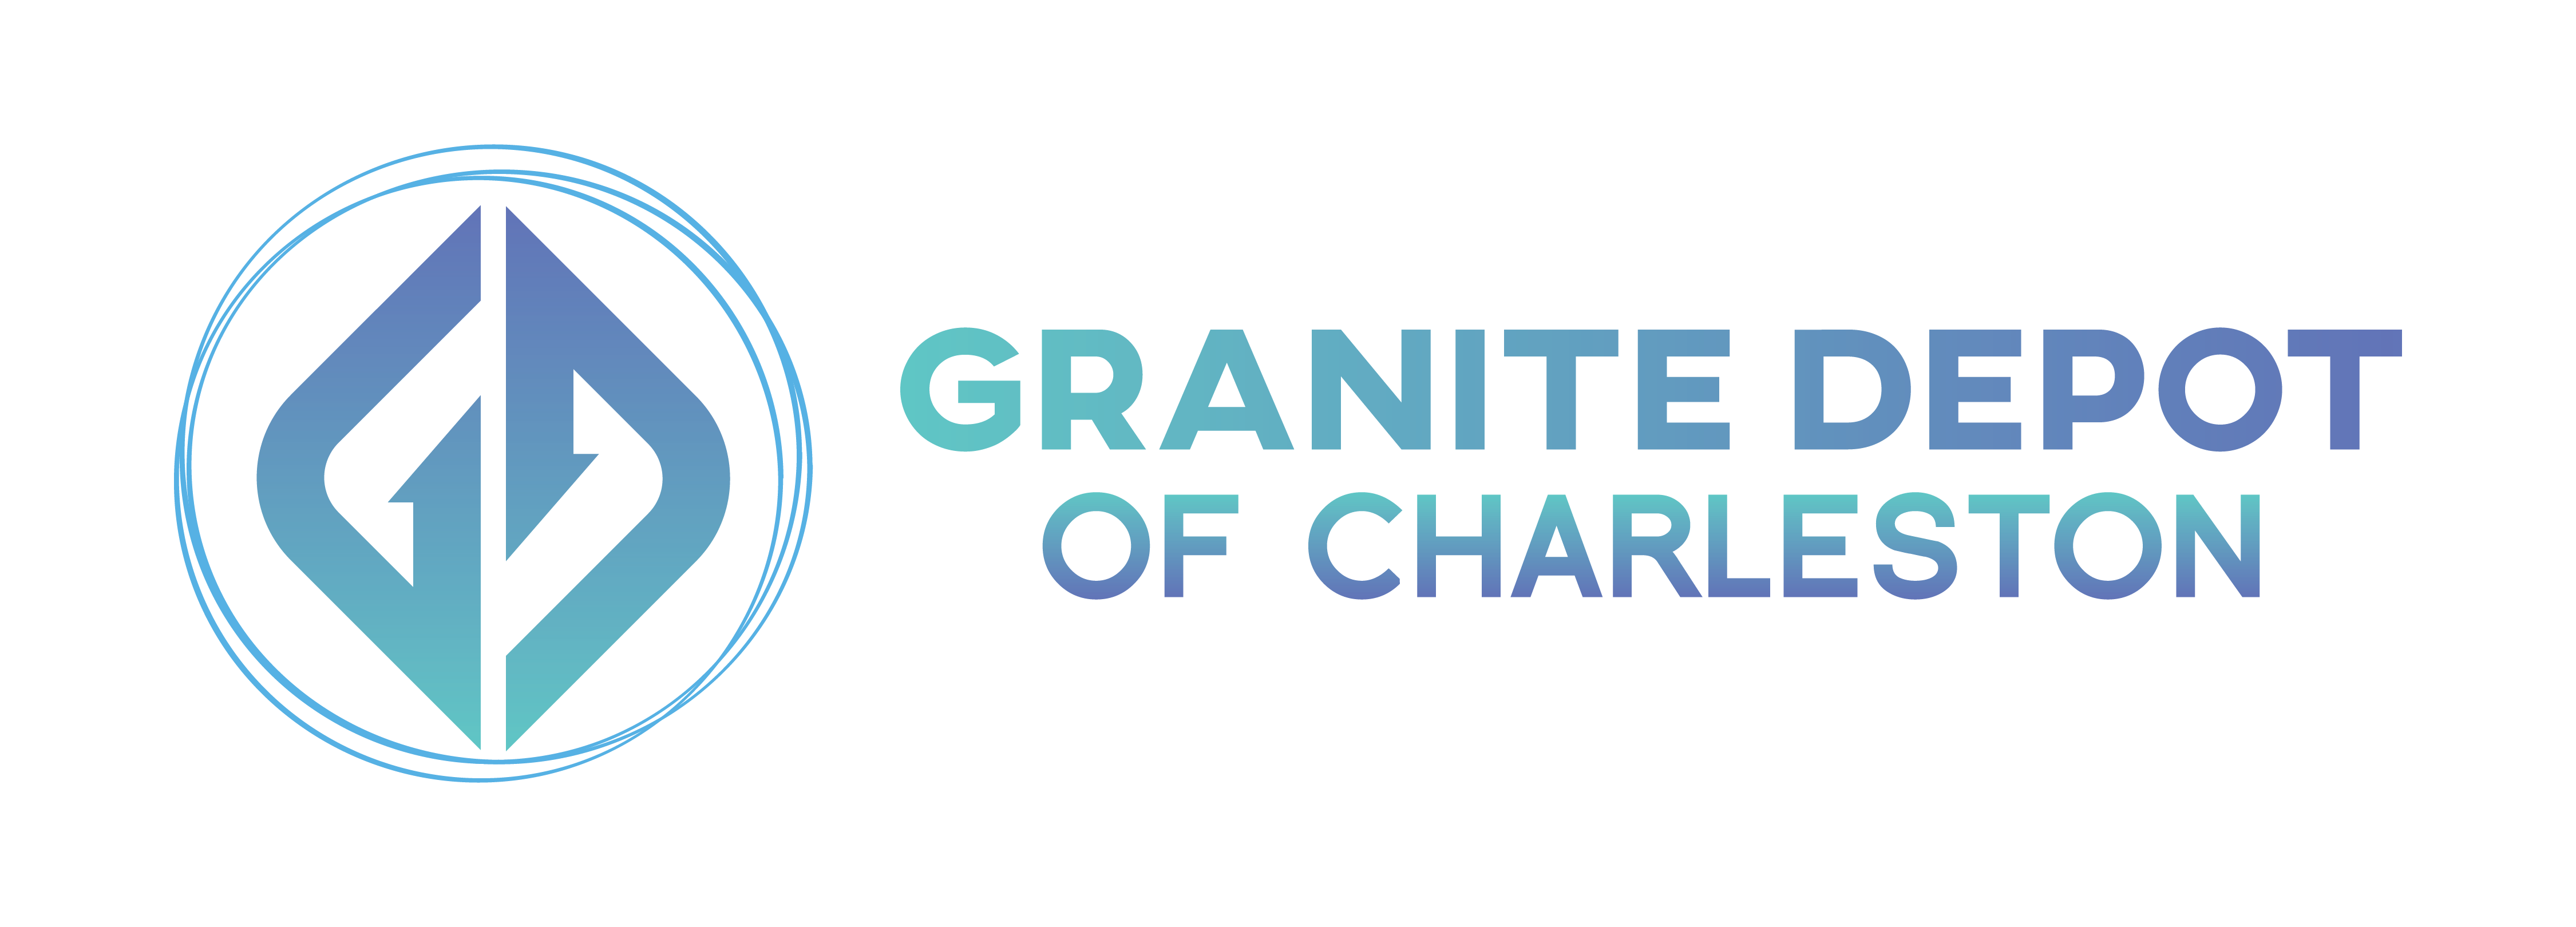 https://www.granitedepotcharleston.com/